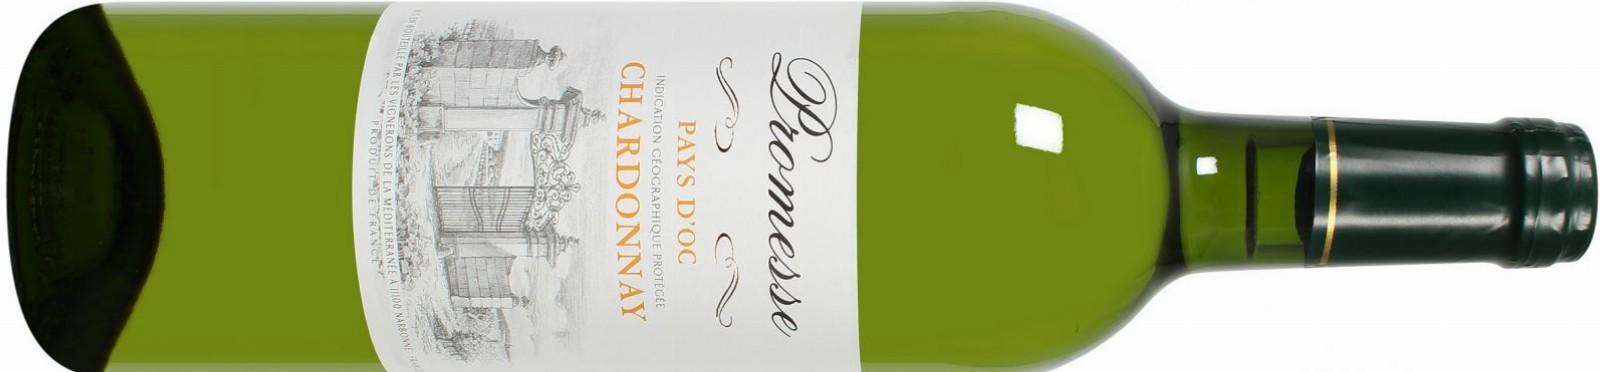 Promesse Chardonnay 2013